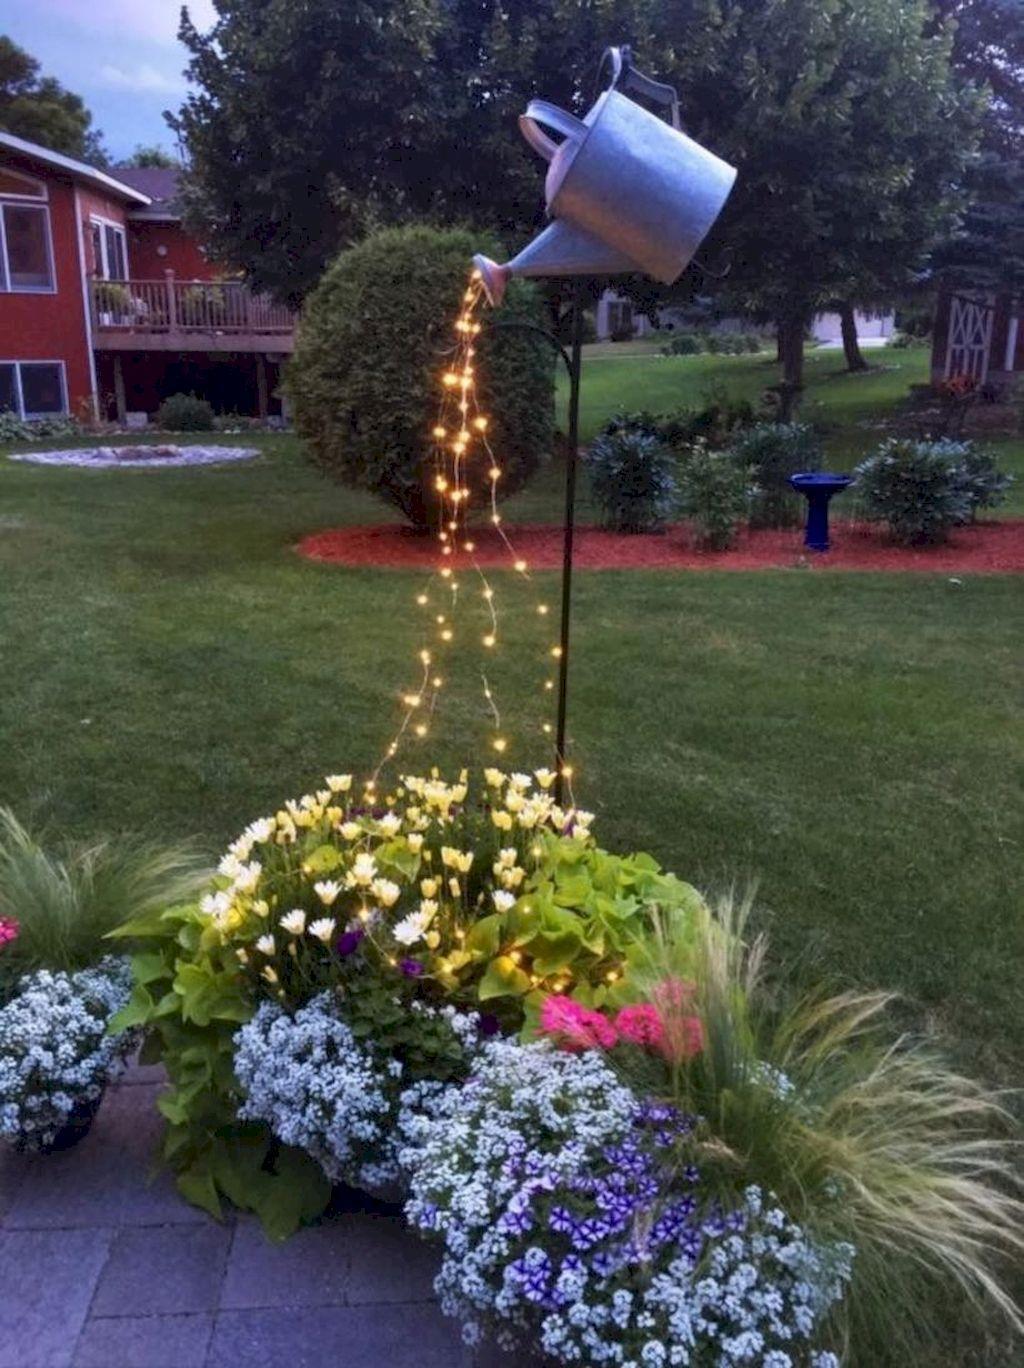 75 Fresh Beautiful Spring Garden Landscaping for Front Yard and Backyard Ideas - Homekover#backyard #beautiful #fresh #front #garden #homekover #ideas #landscaping #spring #yard